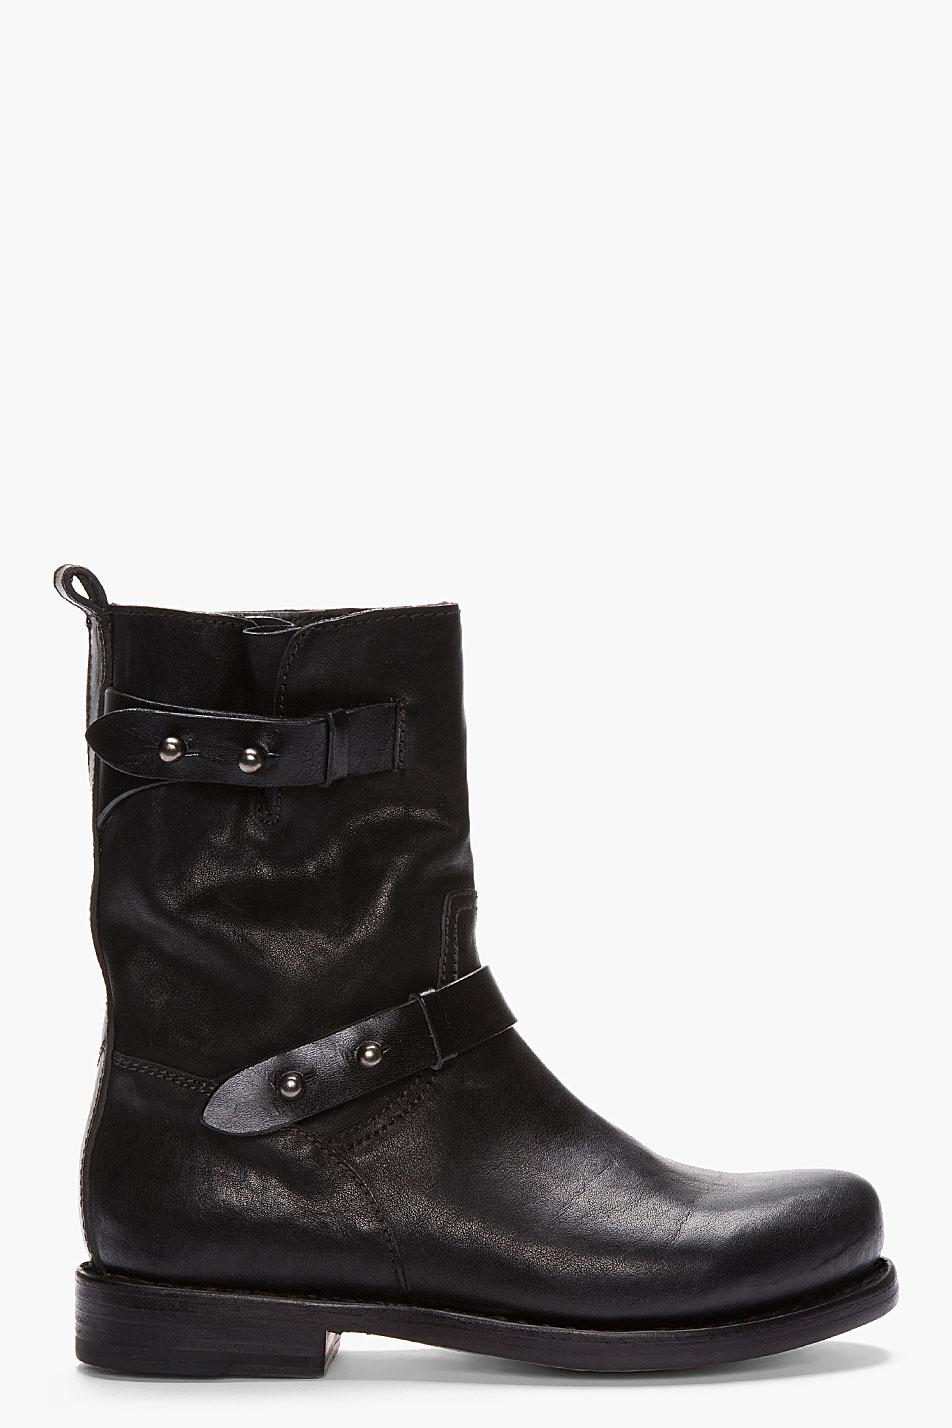 Lyst Rag Amp Bone Black Leather Moto Boots In Black